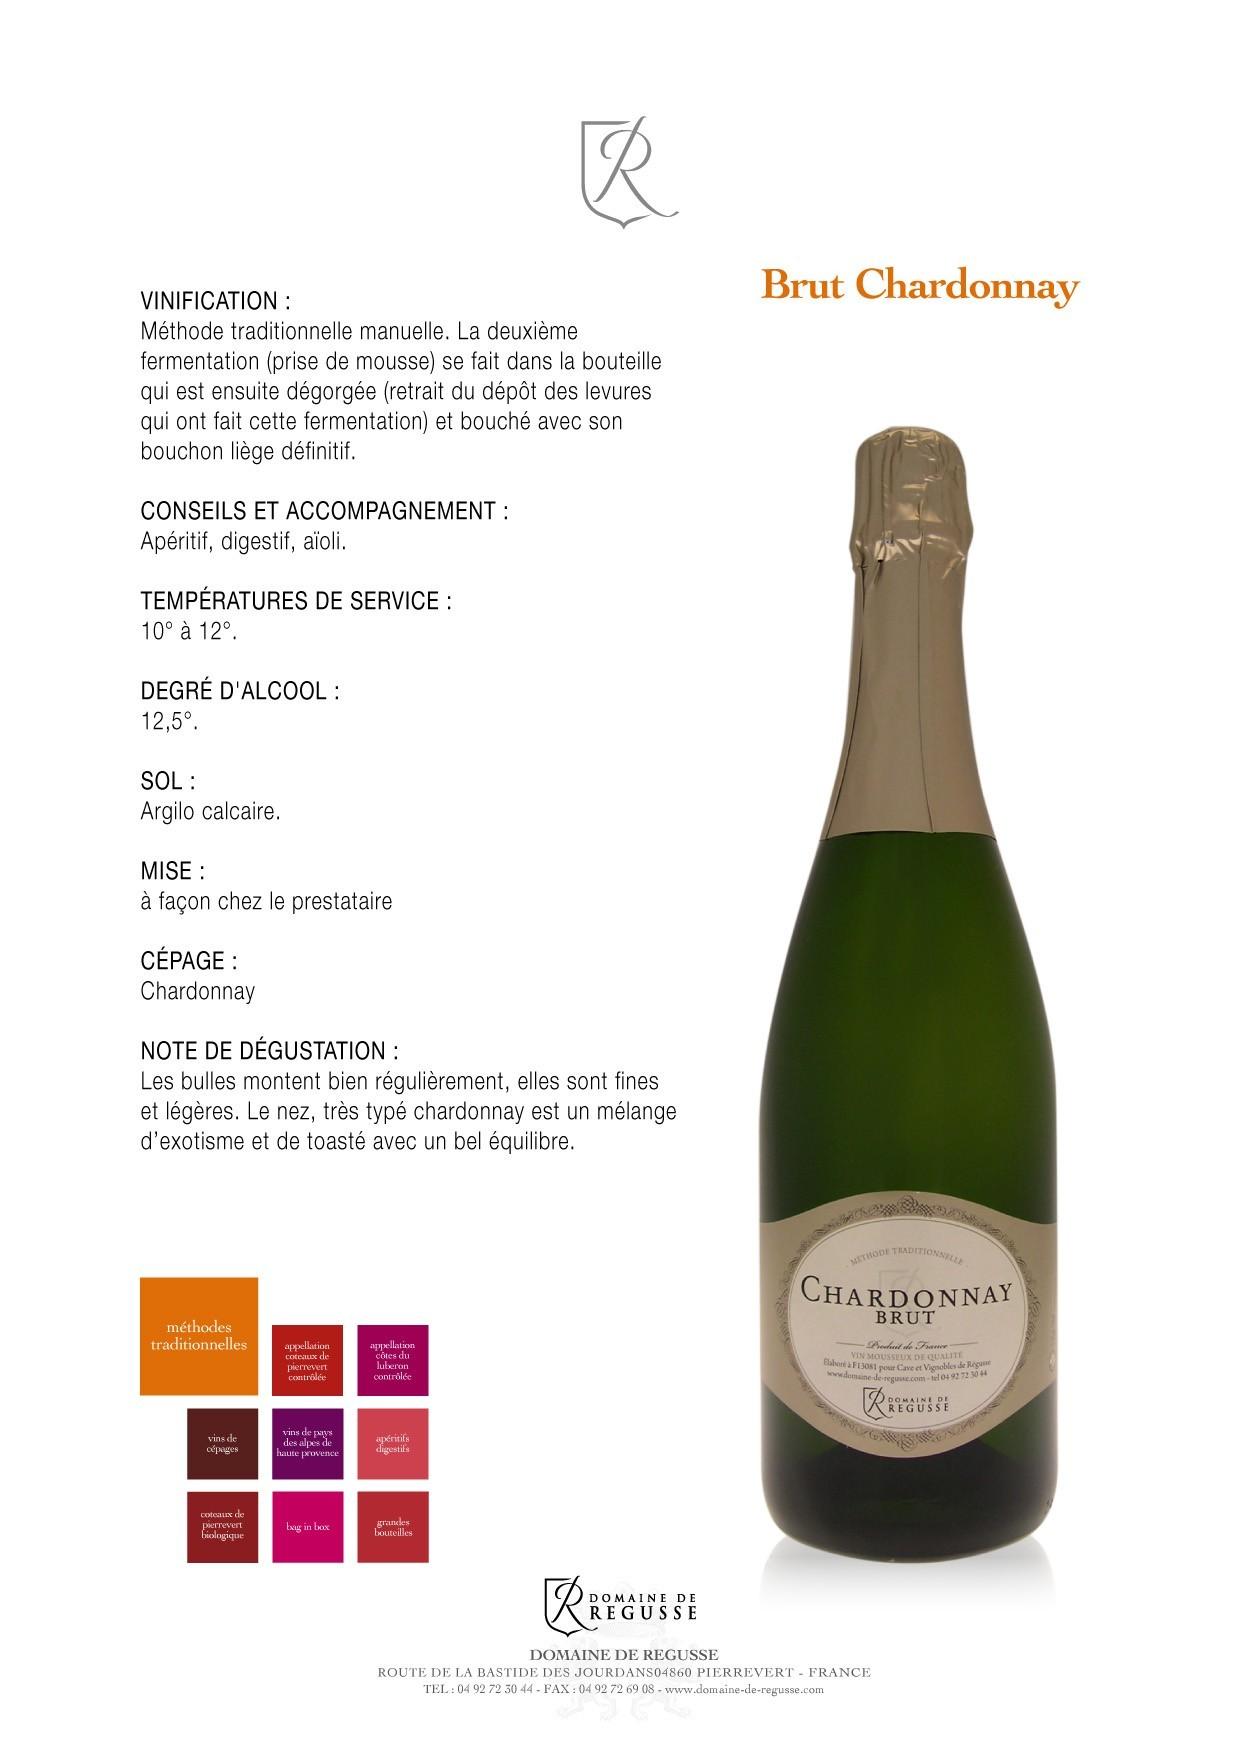 Brut chardonnay ok